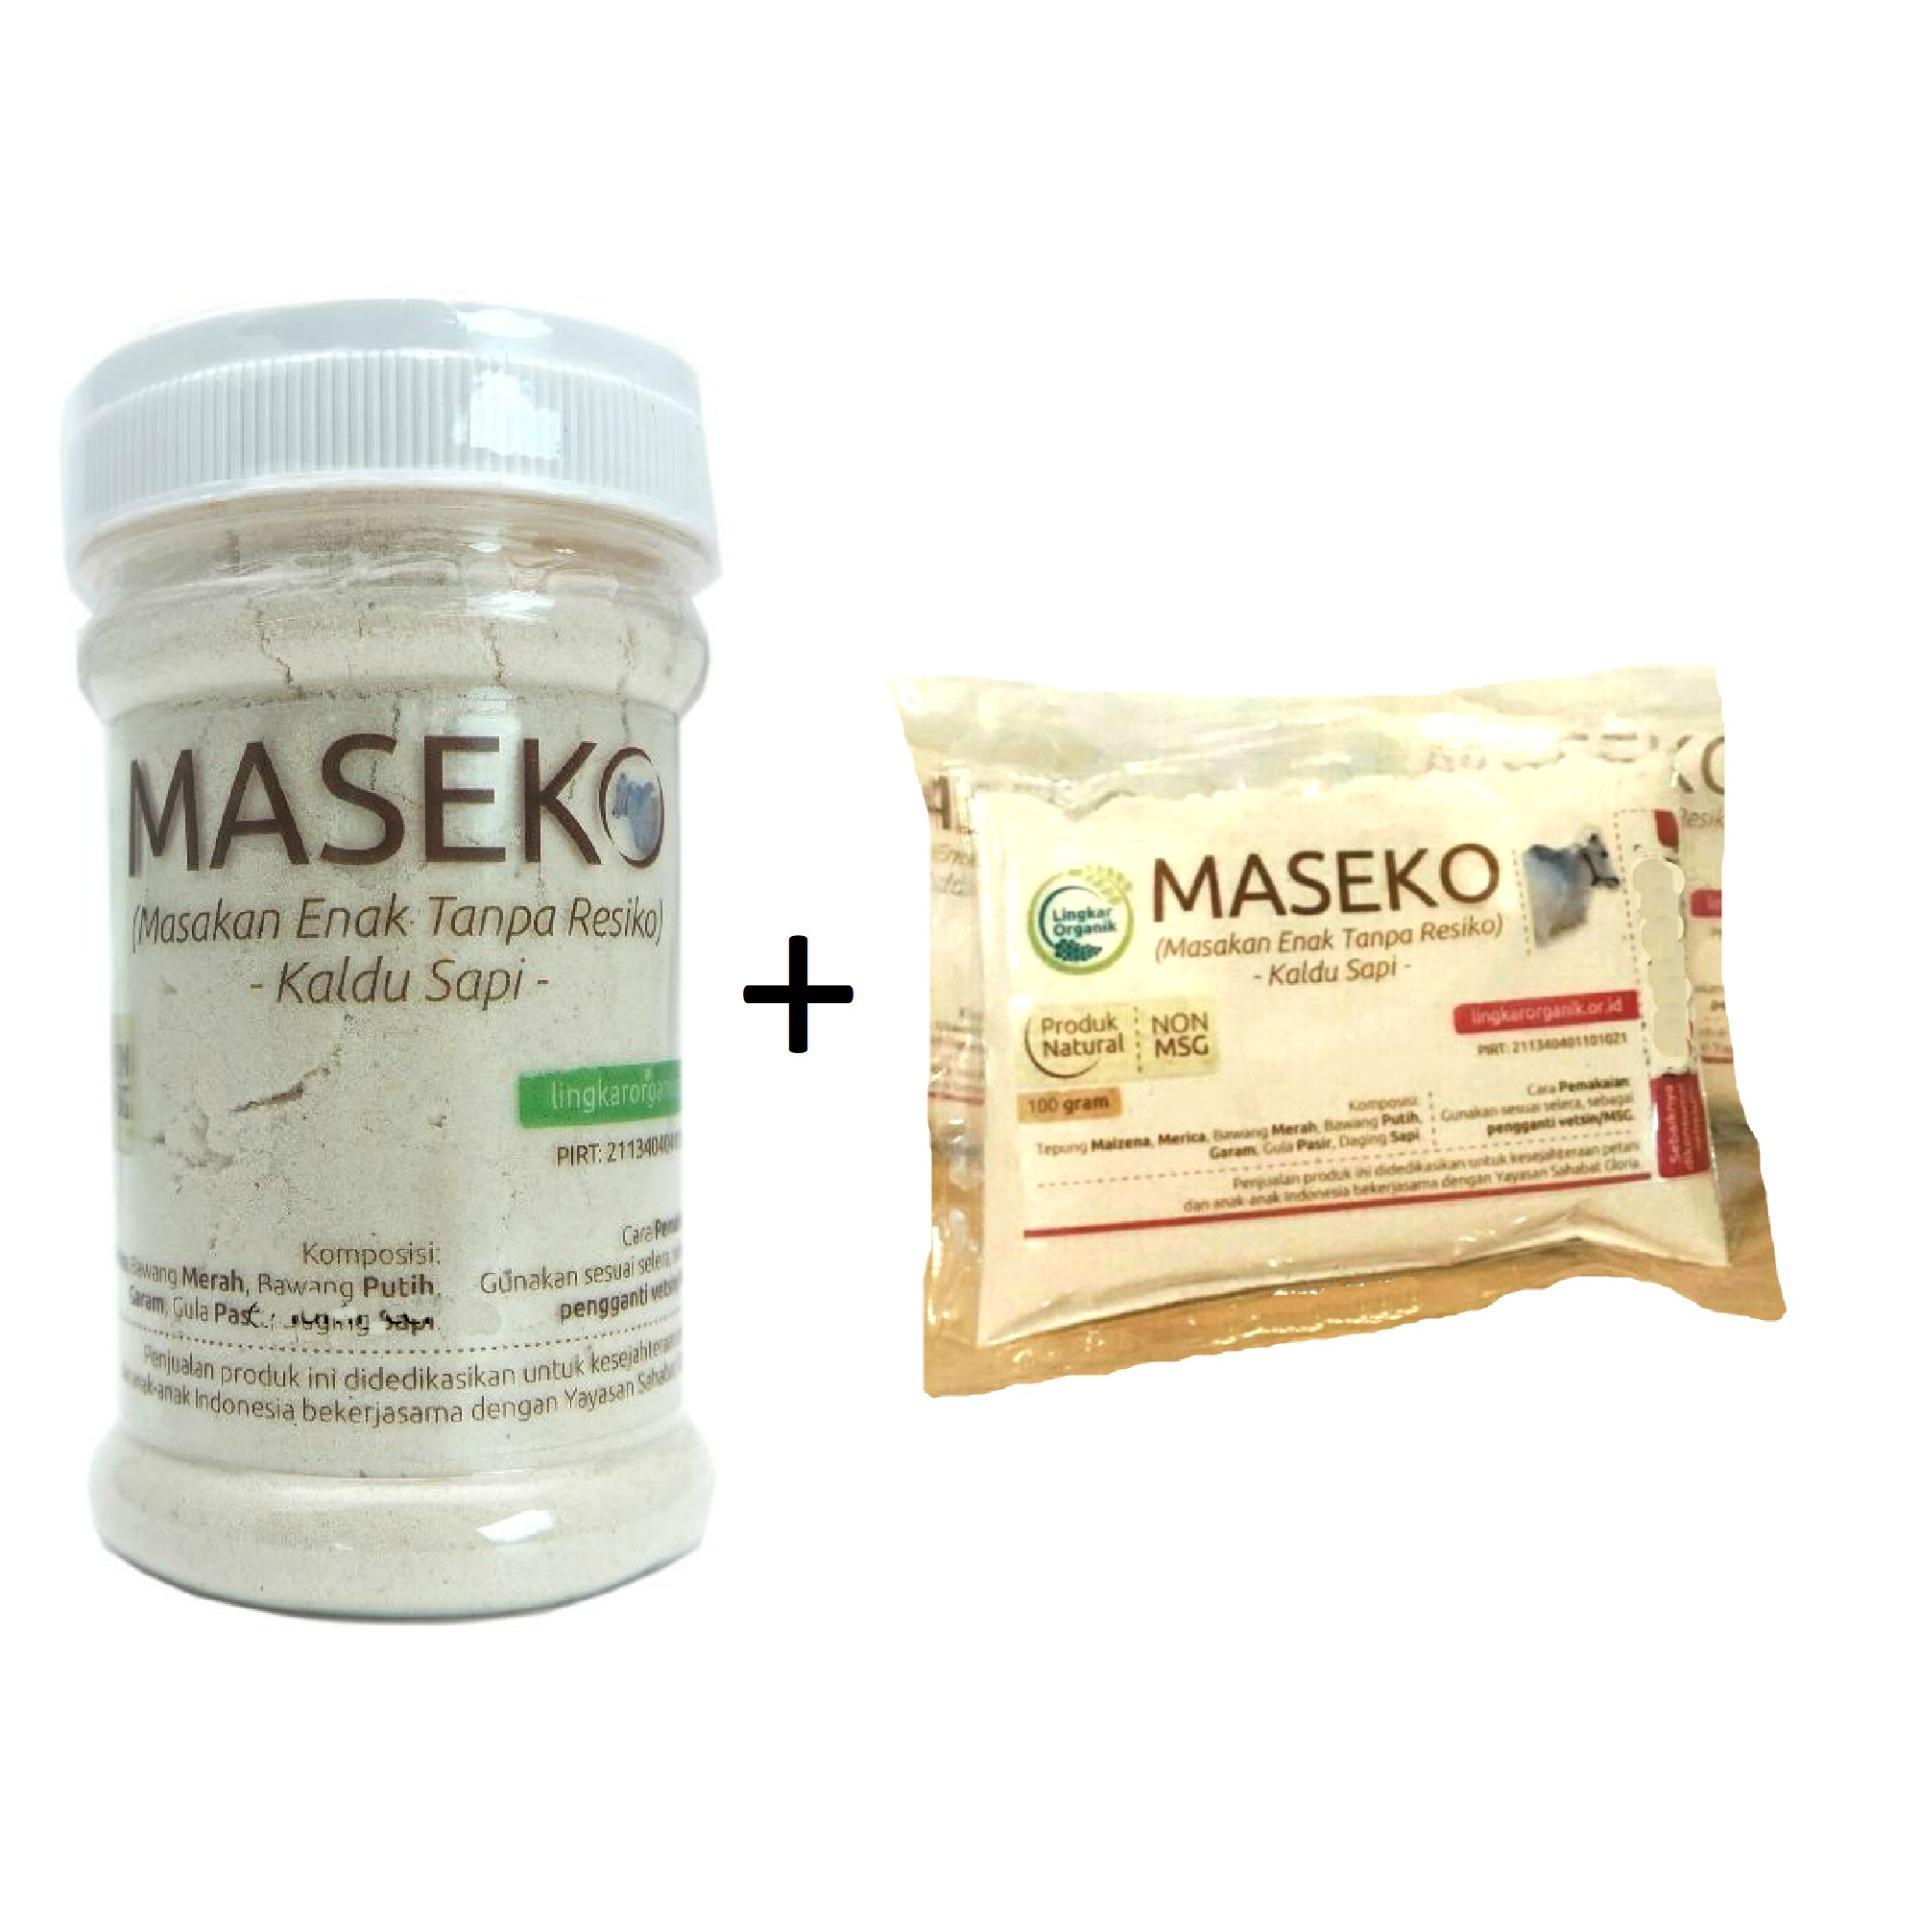 TheOrganicStop Maseko Kaldu Sapi + Refill Non-MSG MPASI @100 gram